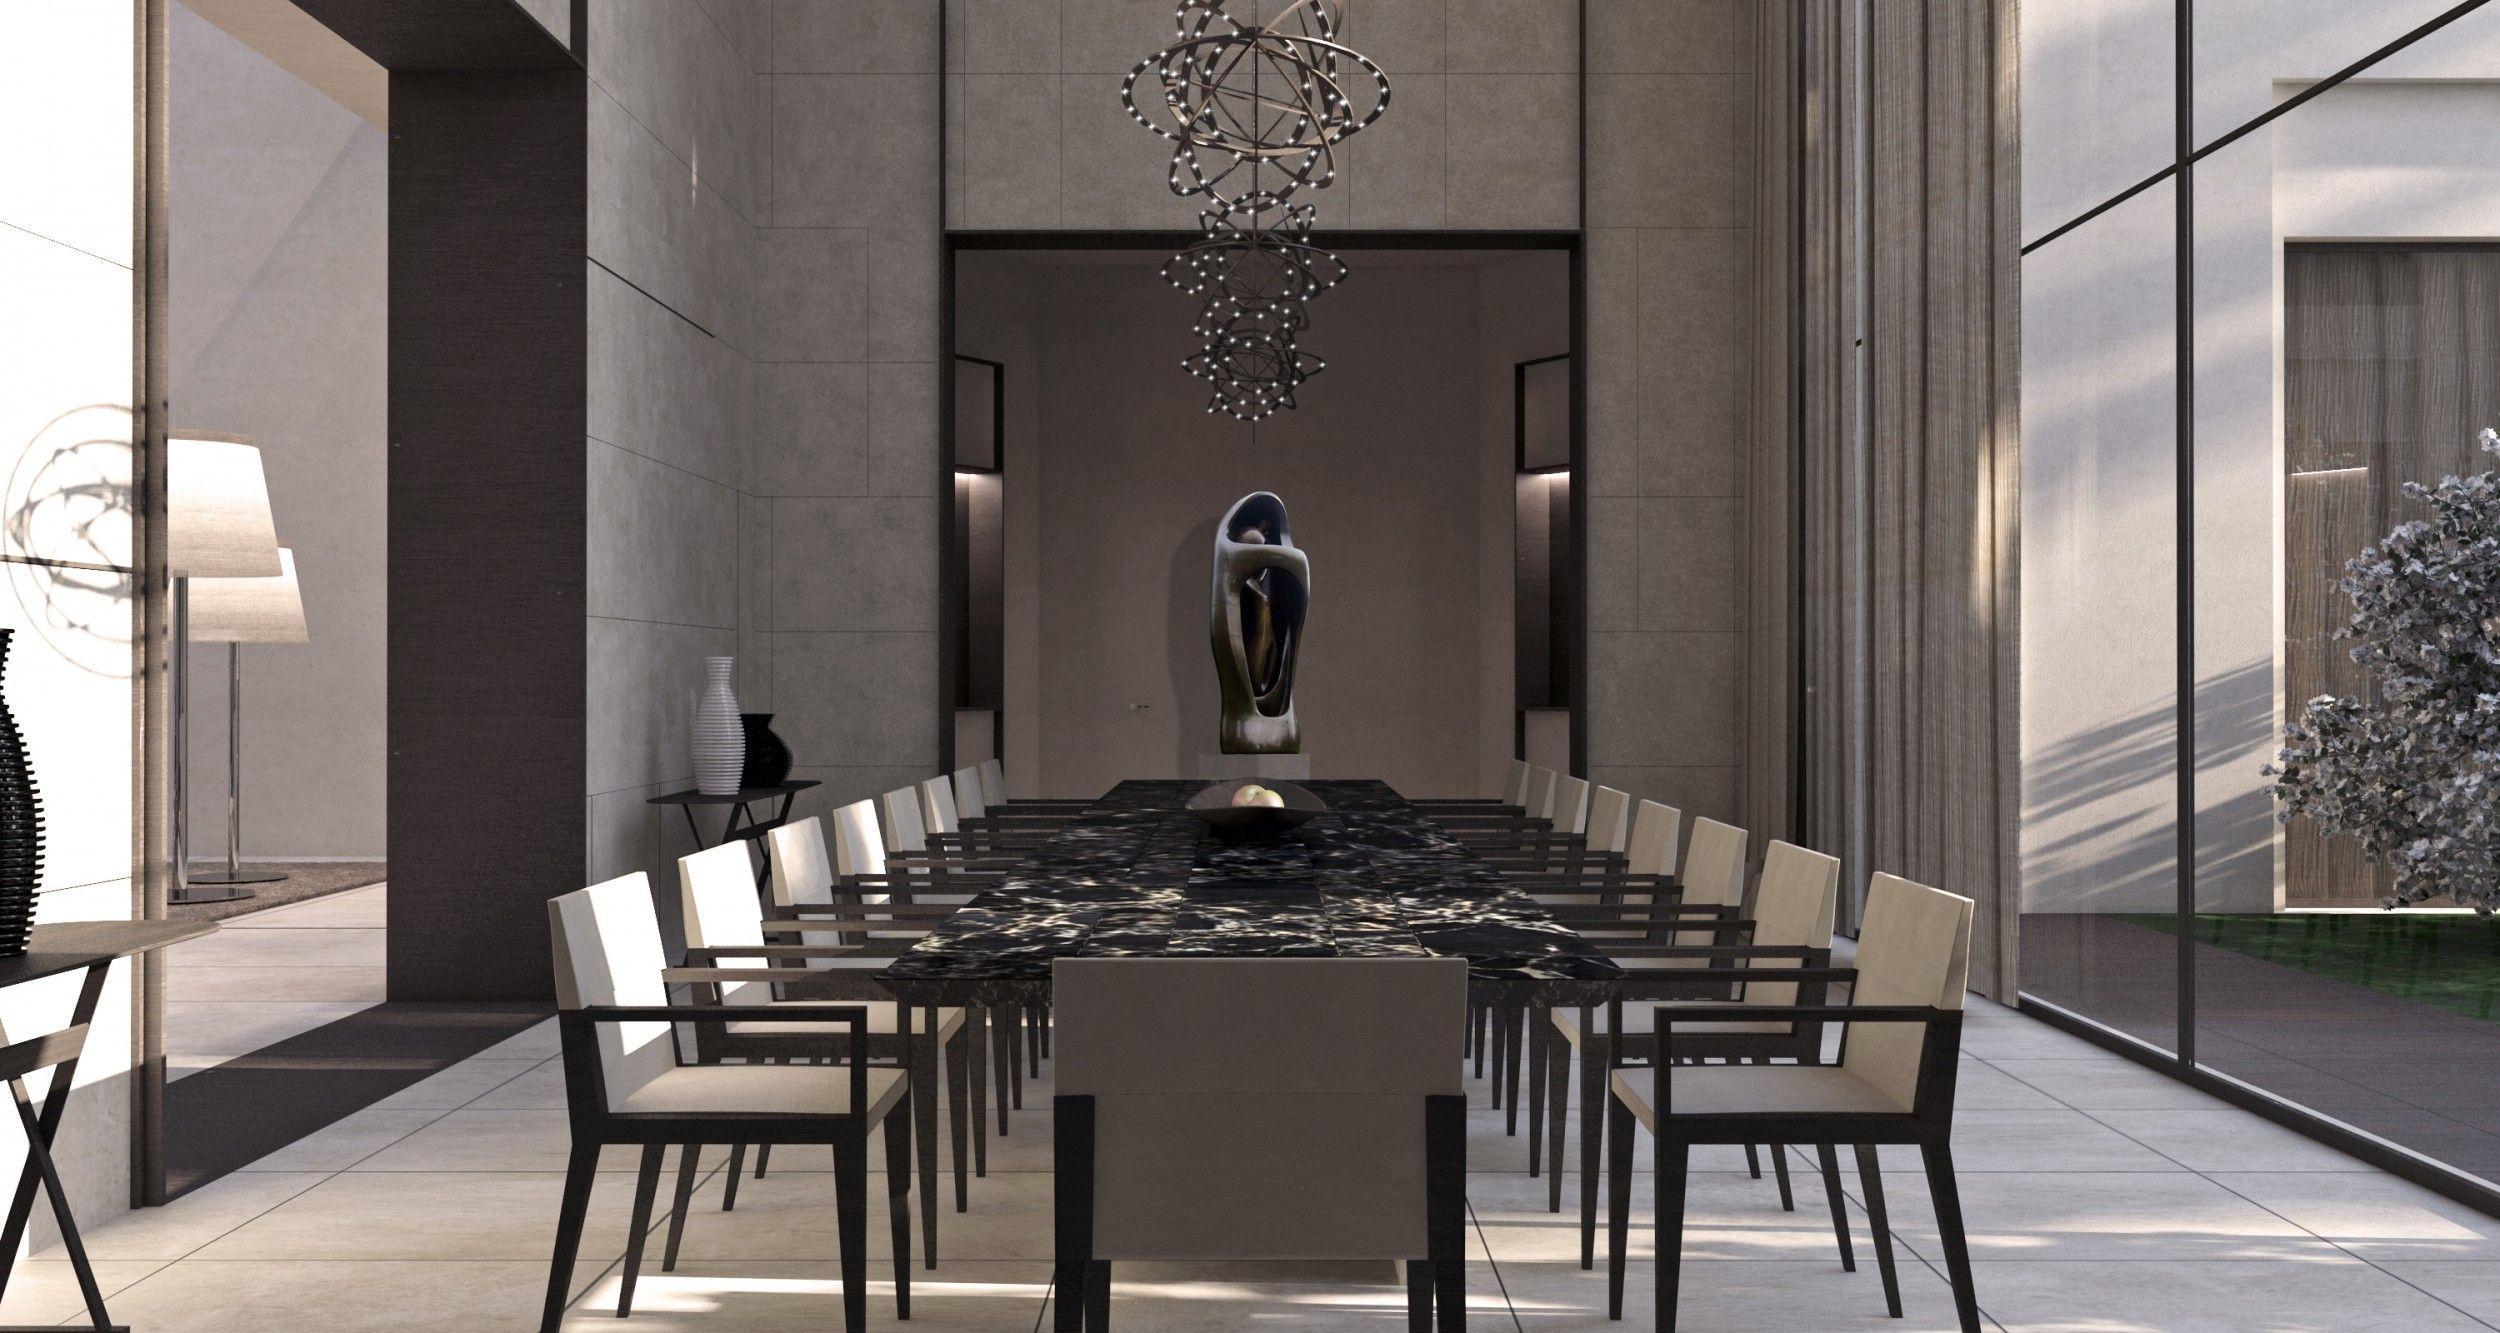 Best International Interior Designers To An Exclusive Private Villa Matteo Nunziati Lobby Interior Design Central London Apartments Dining Room Interiors